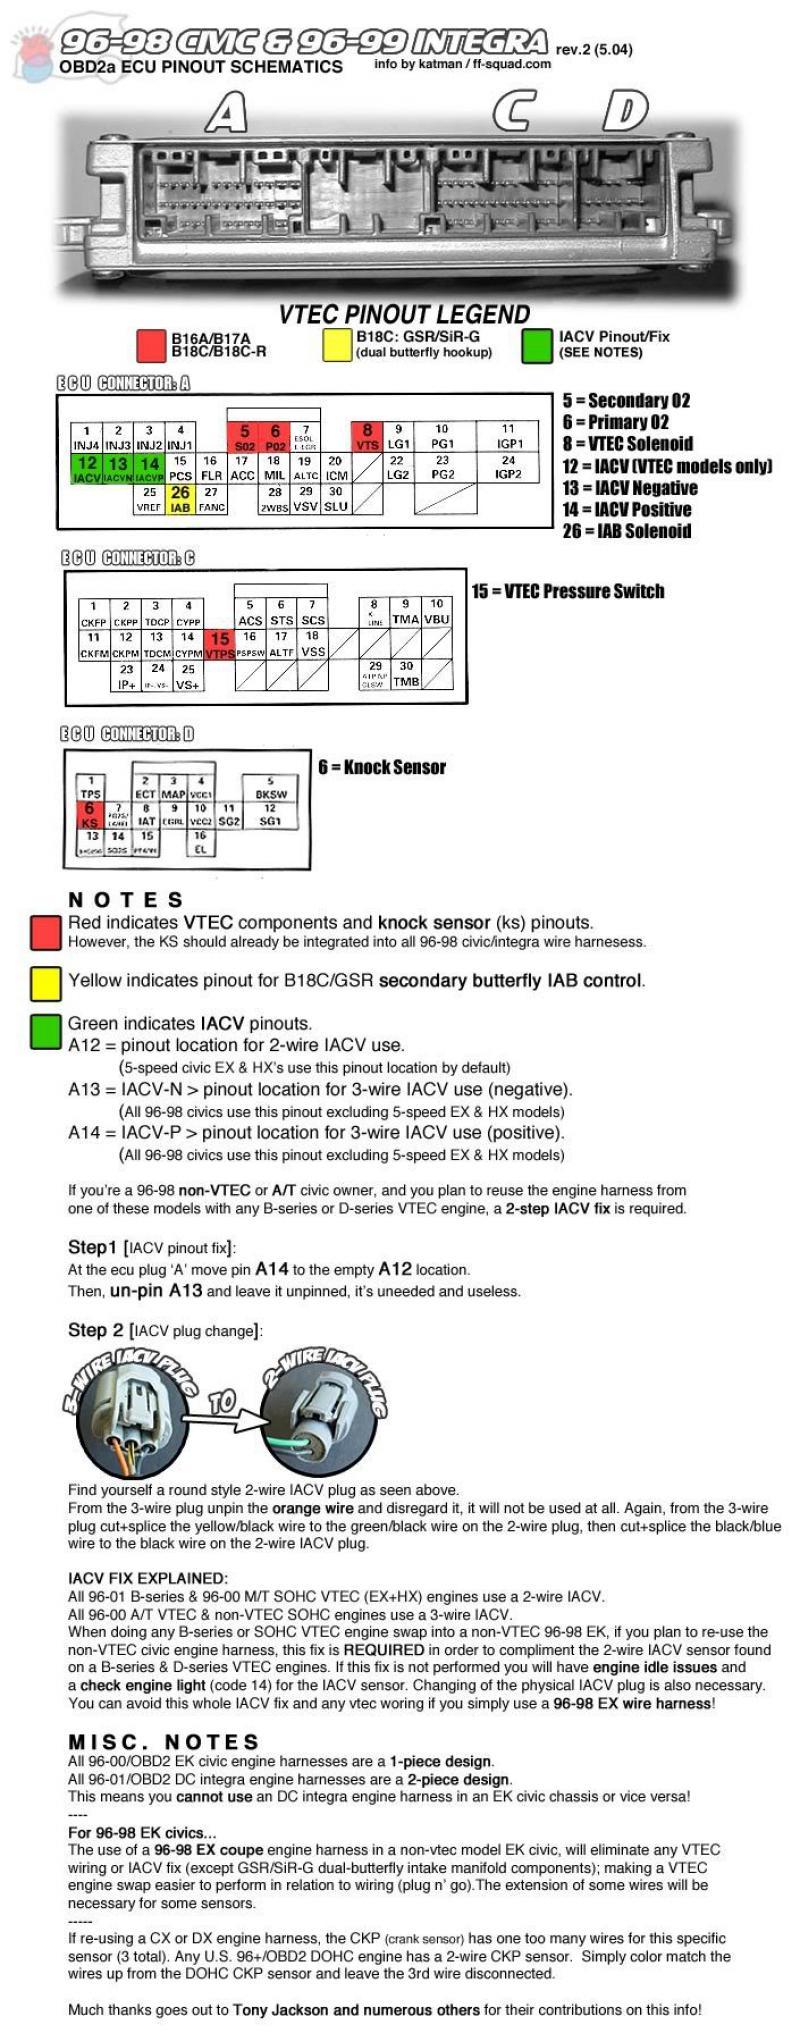 XR_5891] Wiring Diagram Civic Obd2 Ckf Download DiagramOphen Cosm Spoat Over Epete Elae Jebrp Mohammedshrine Librar Wiring 101